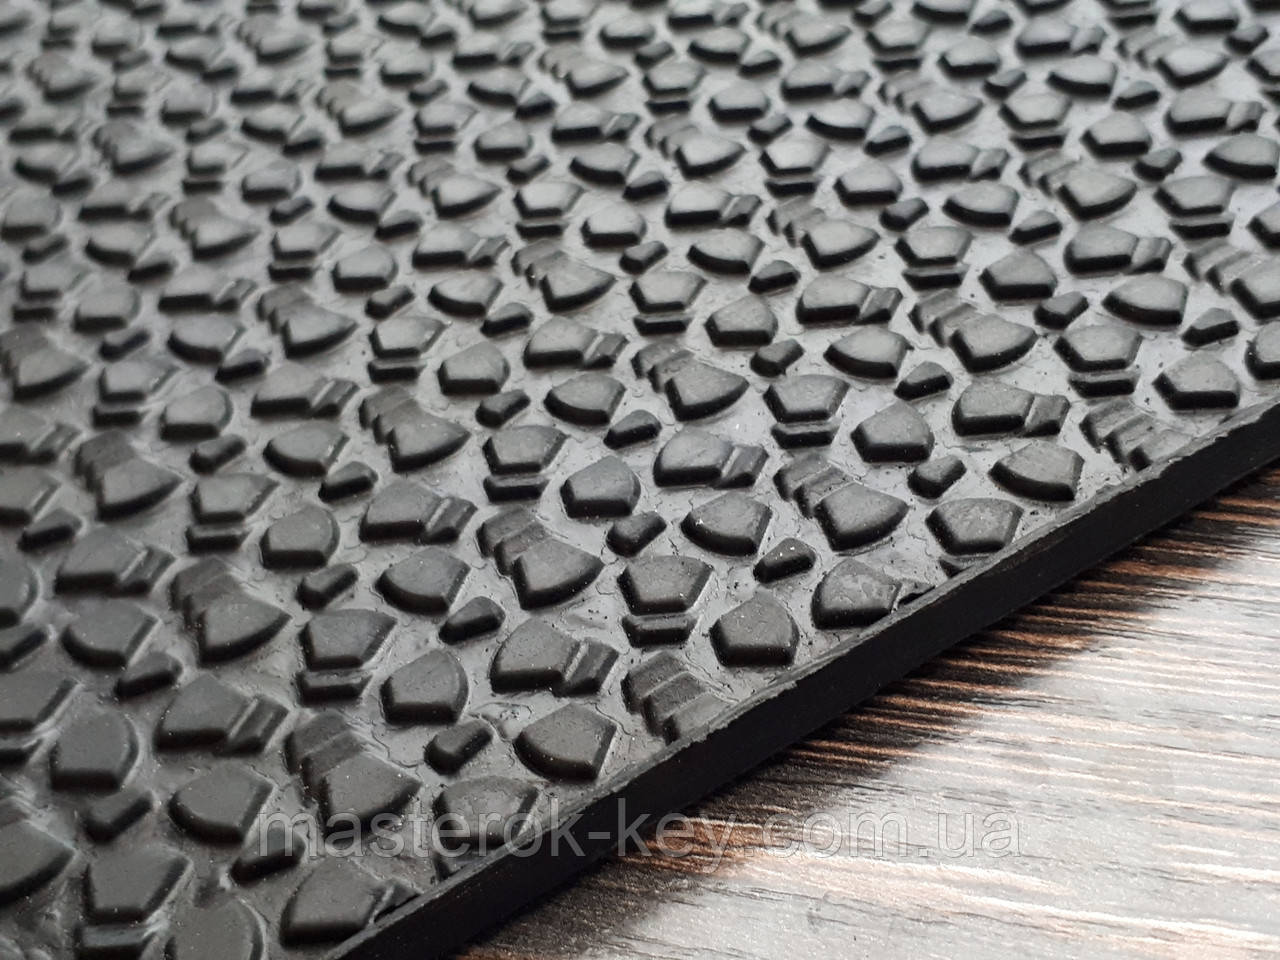 Резина набоечная каучуковая MAGNA WINTER 300х300х6.2 мм цвет чёрный